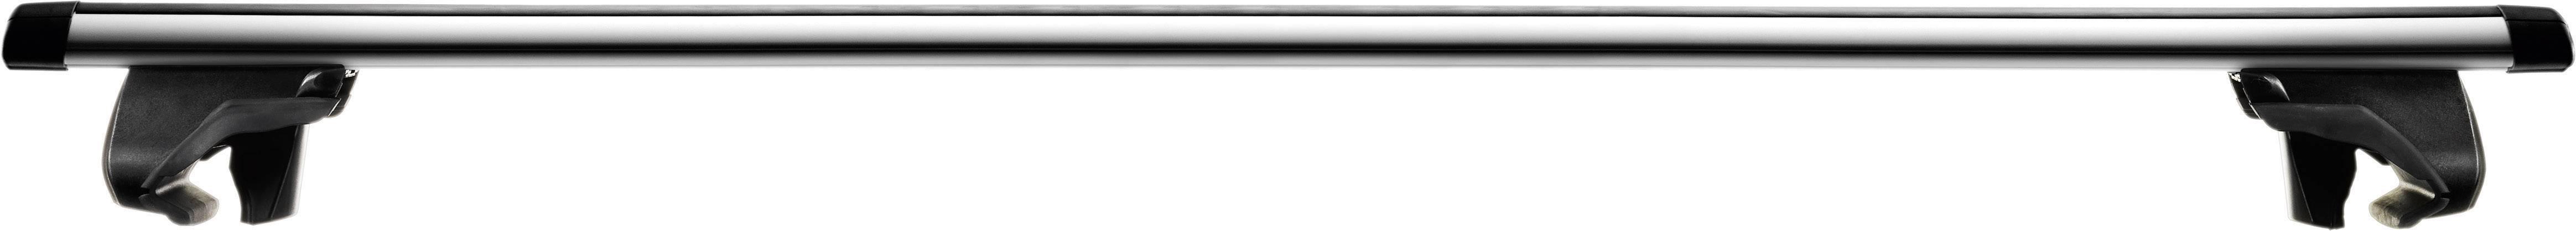 Střešní nosič Thule AeroBar 1200mm Smart Rack 794, (d x š) 124 cm x 2.3 cm